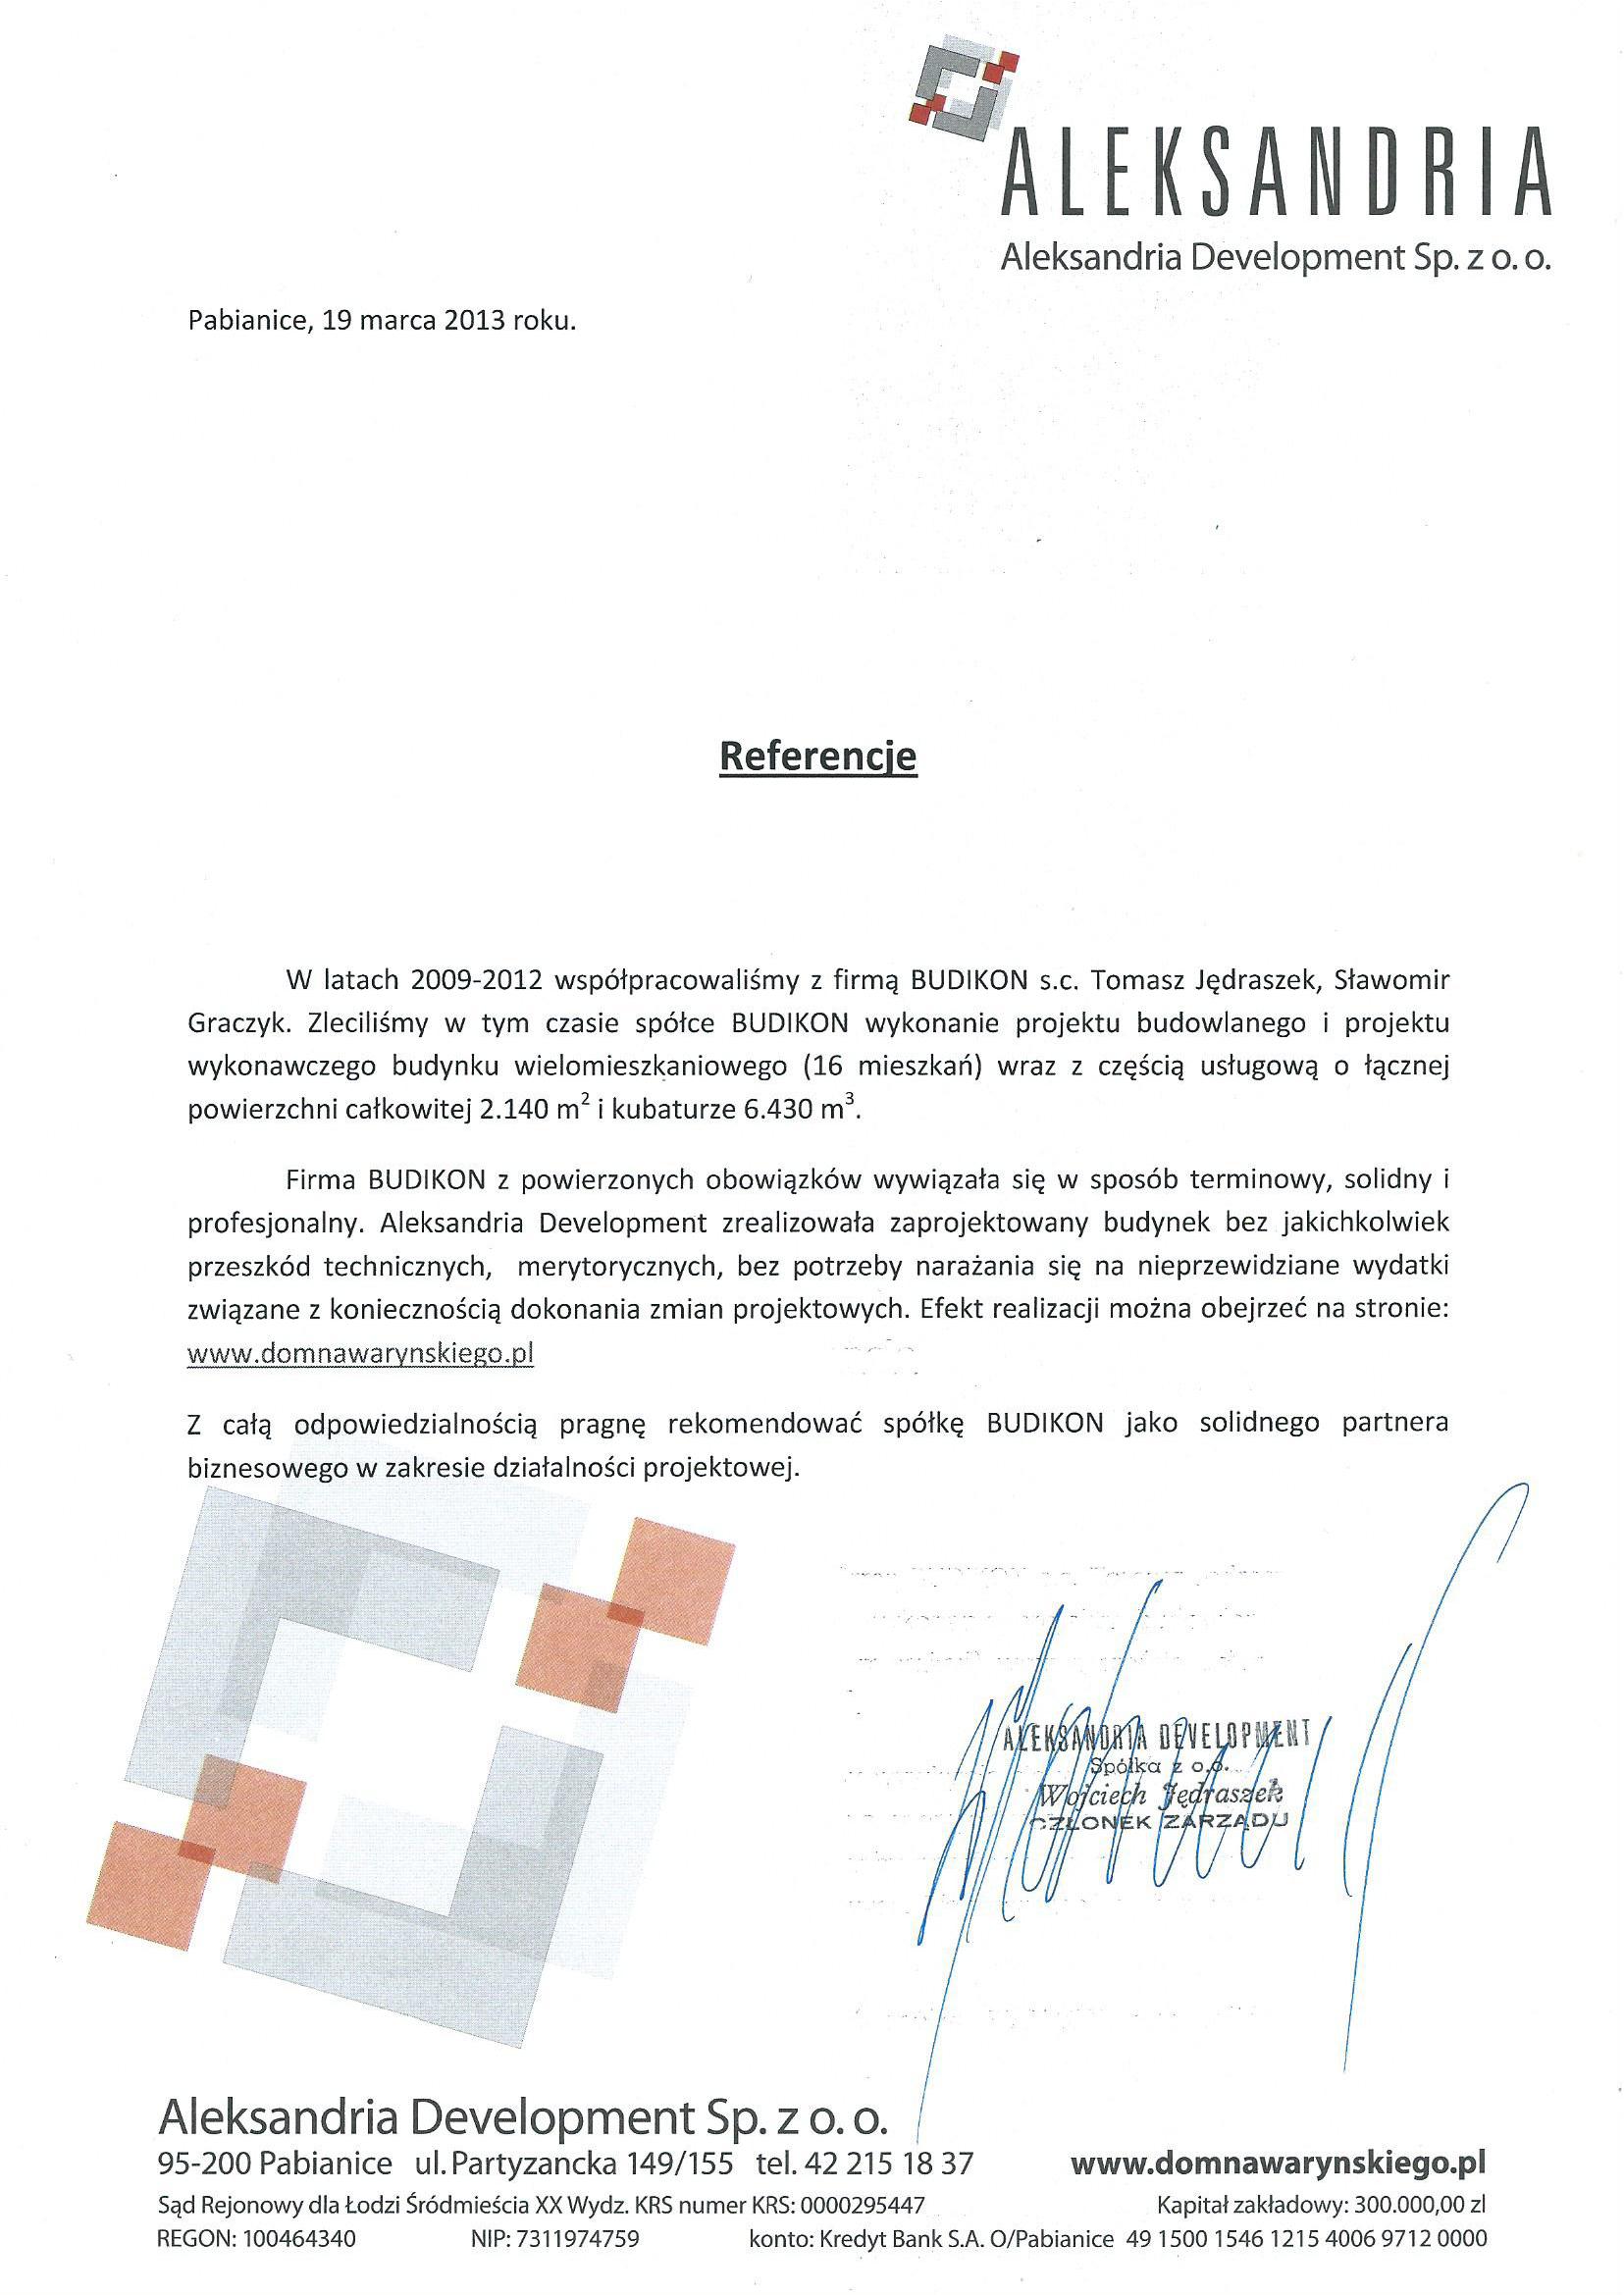 ALEKSANDRIA_DEVELOPMENT-1